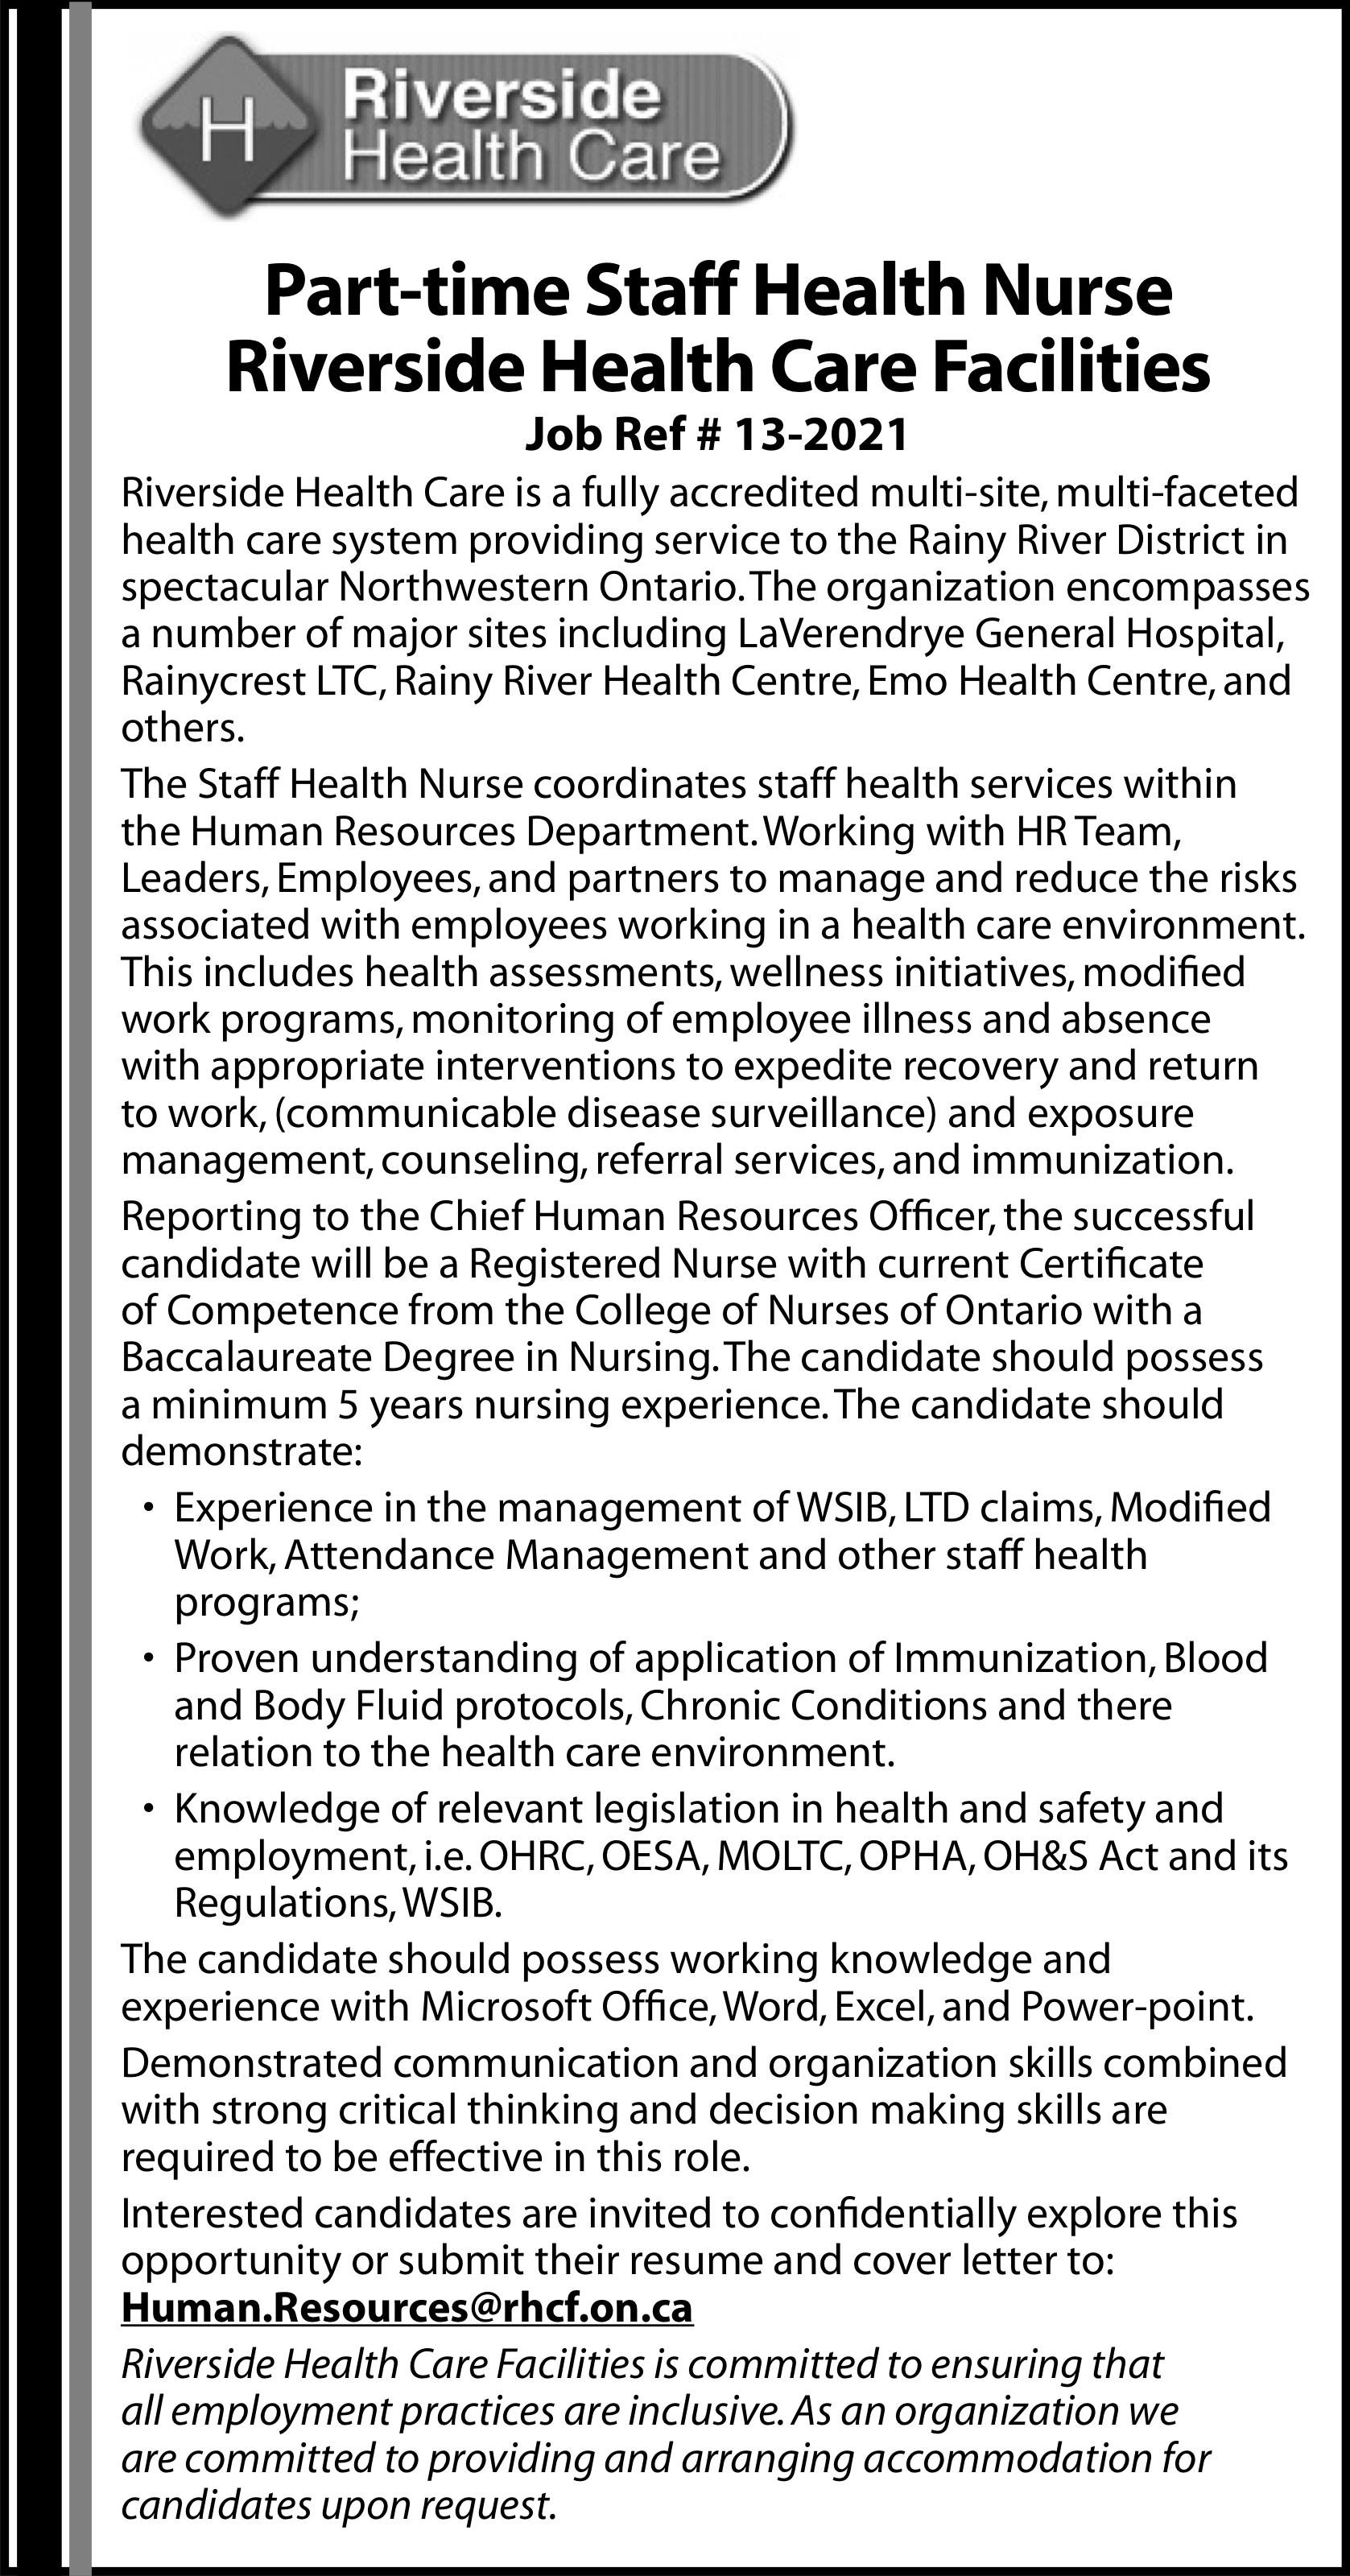 Part-time Staff Health Nurse